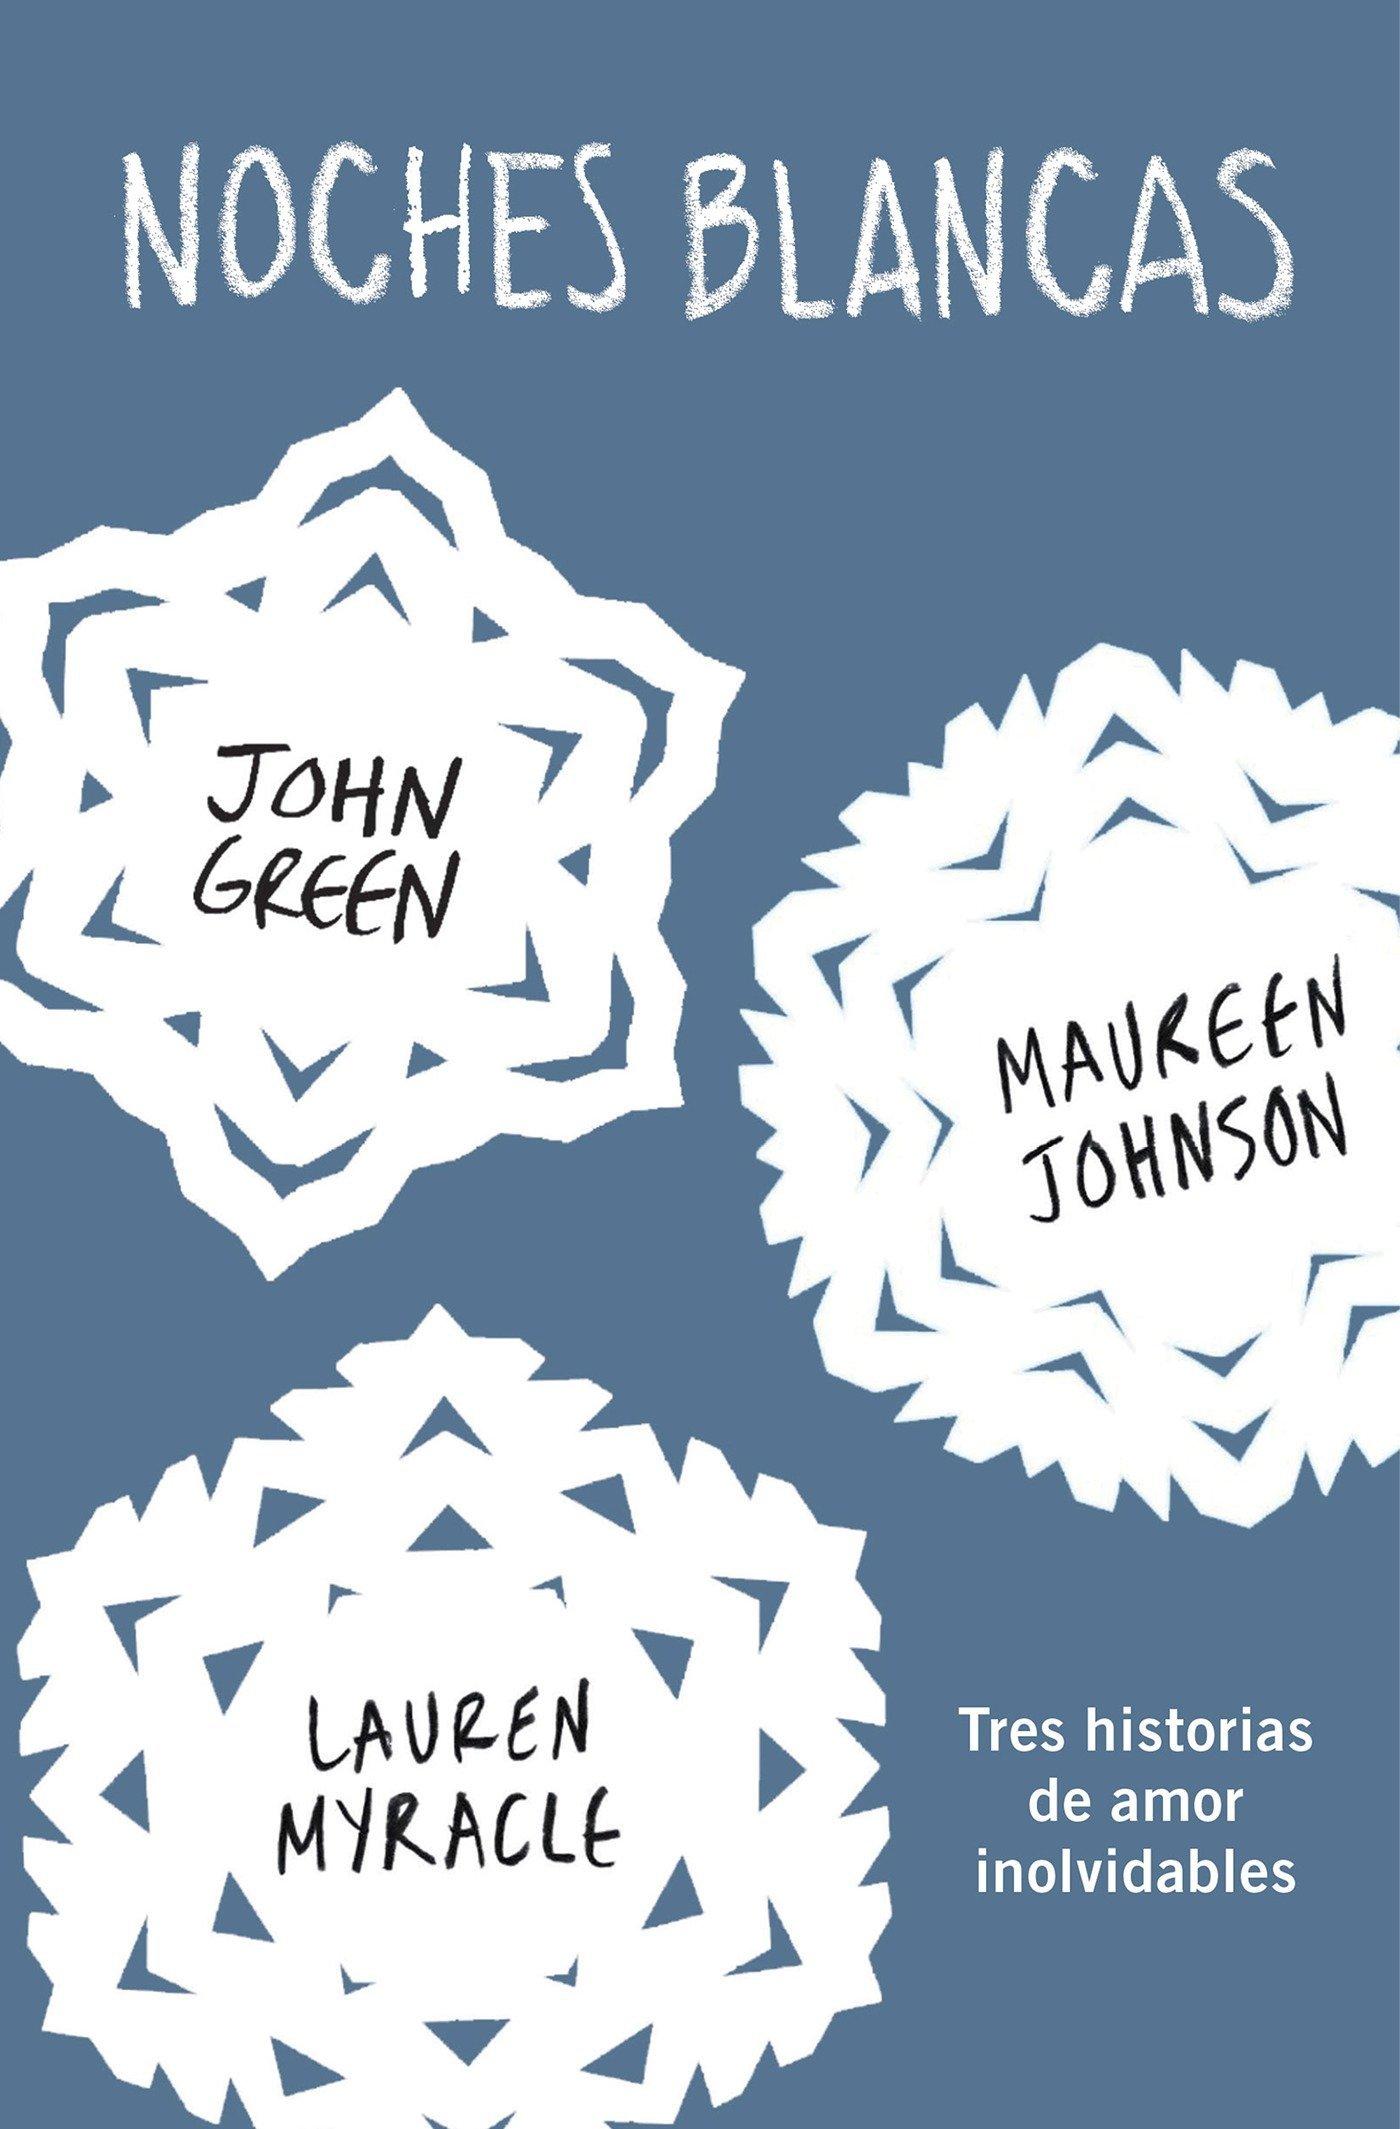 Noches blancas / White Nights: Tres historias de amor inolvidables (Spanish Edition) (Spanish) Paperback – October 27, 2015